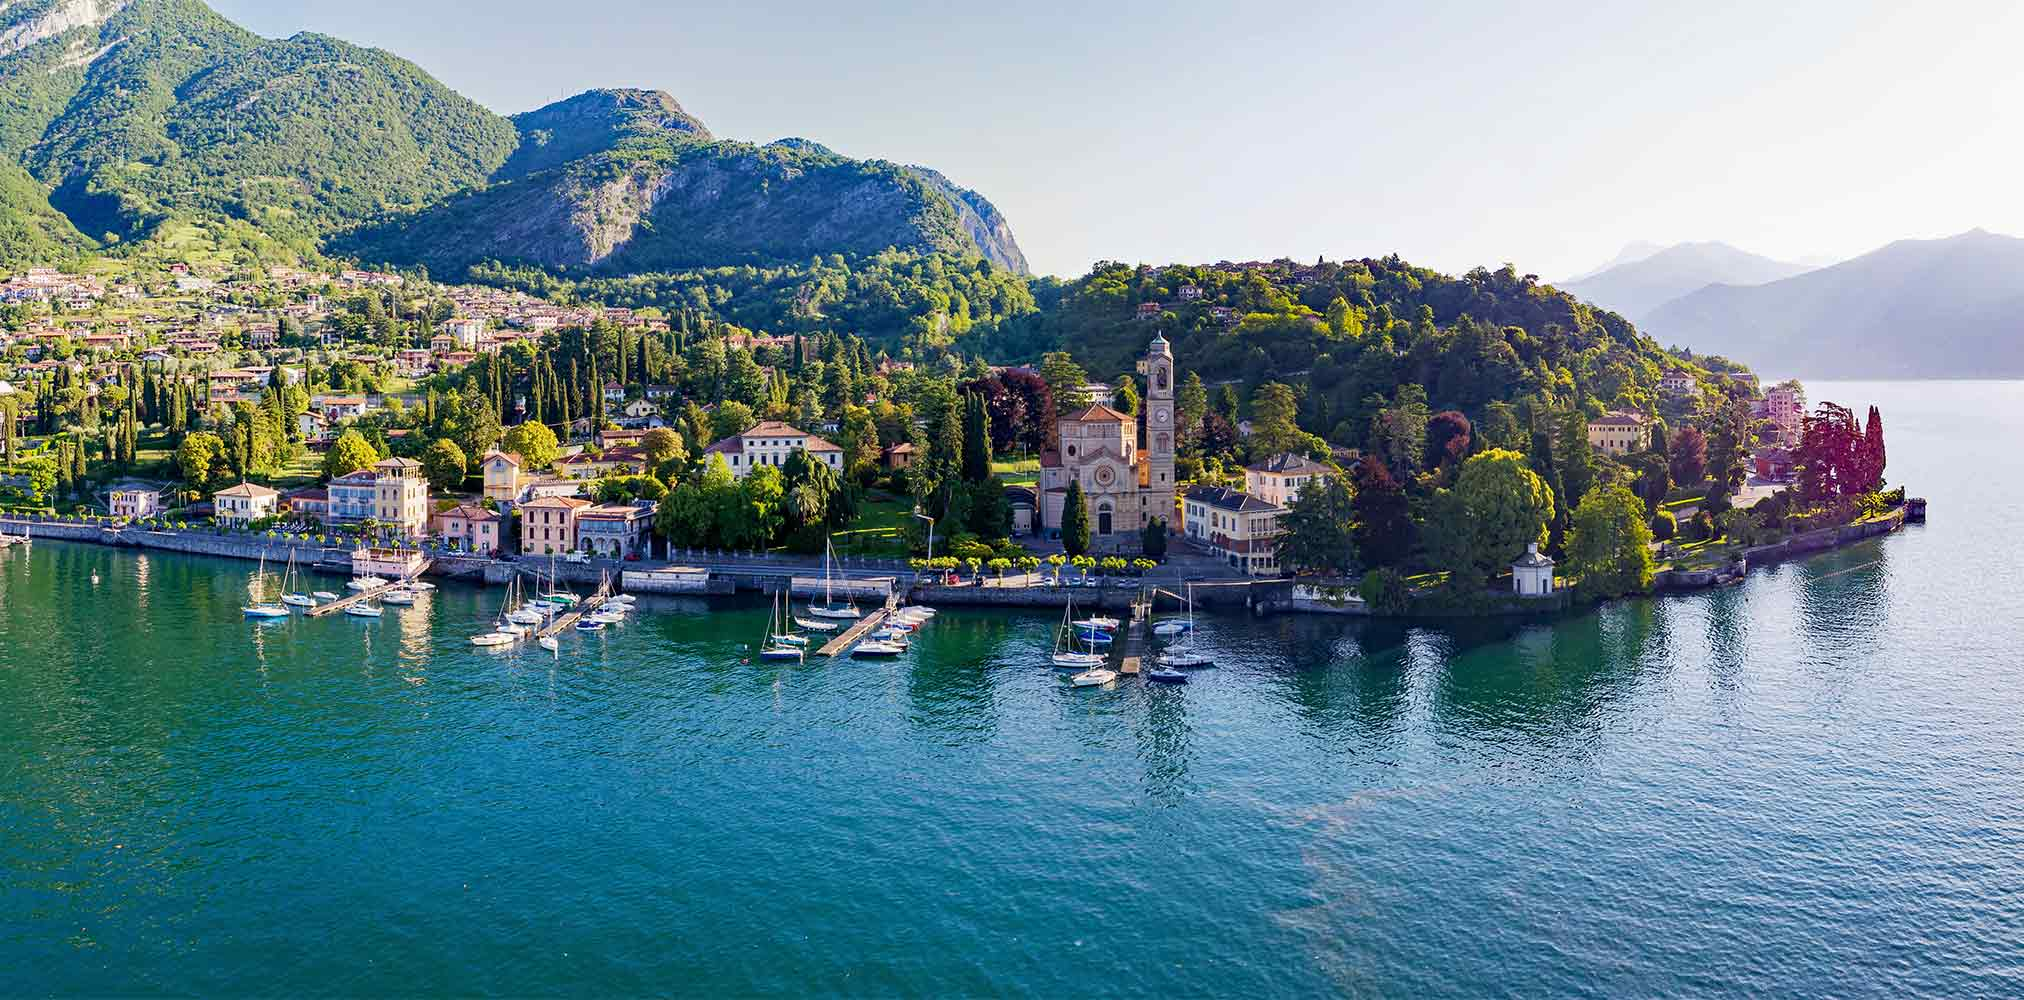 Tremezzina - Lake Como rent Boat -  Cadenazzi